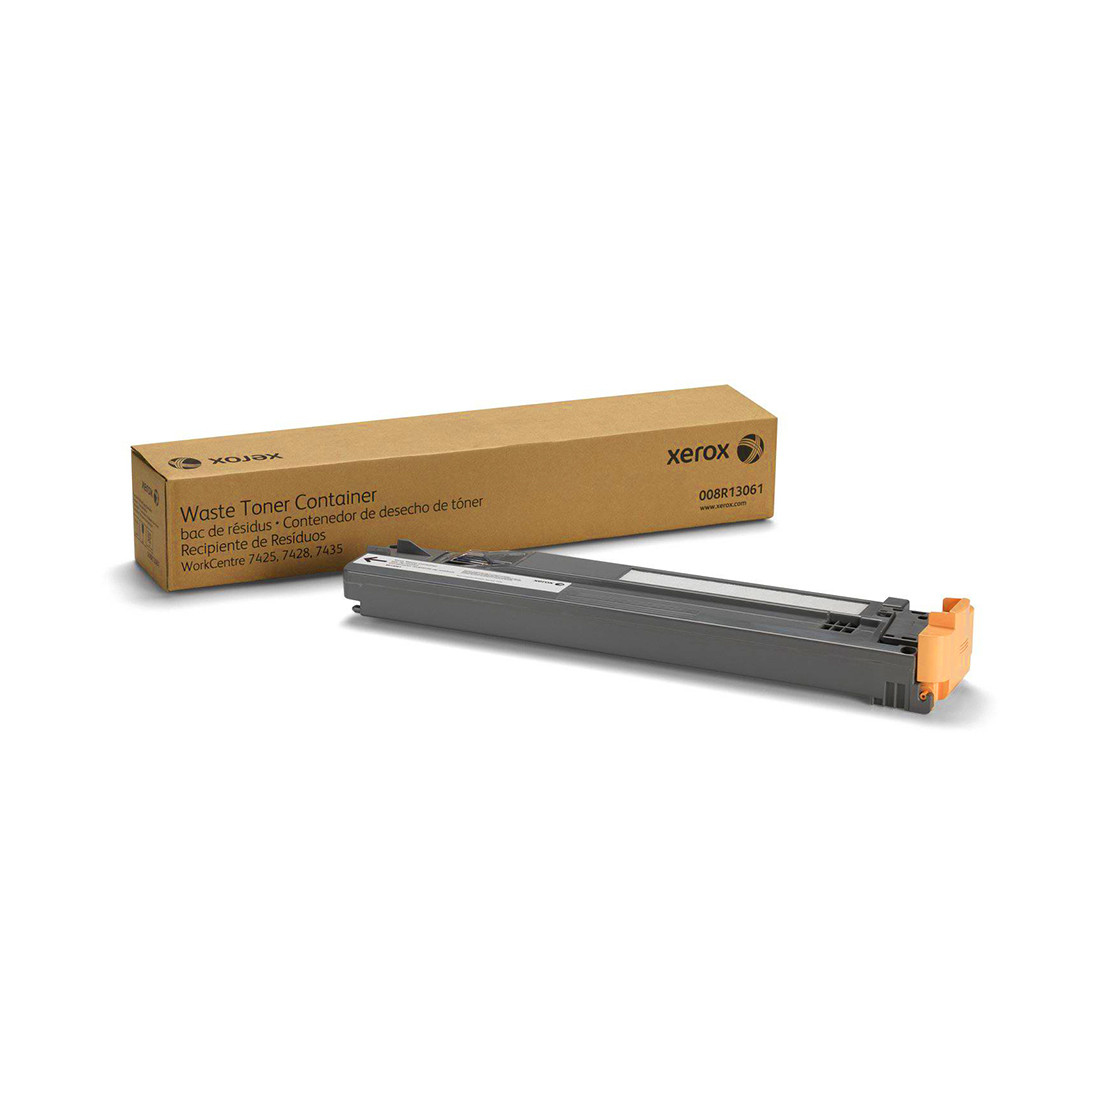 Контейнер для отработанного тонера Xerox 008R13061